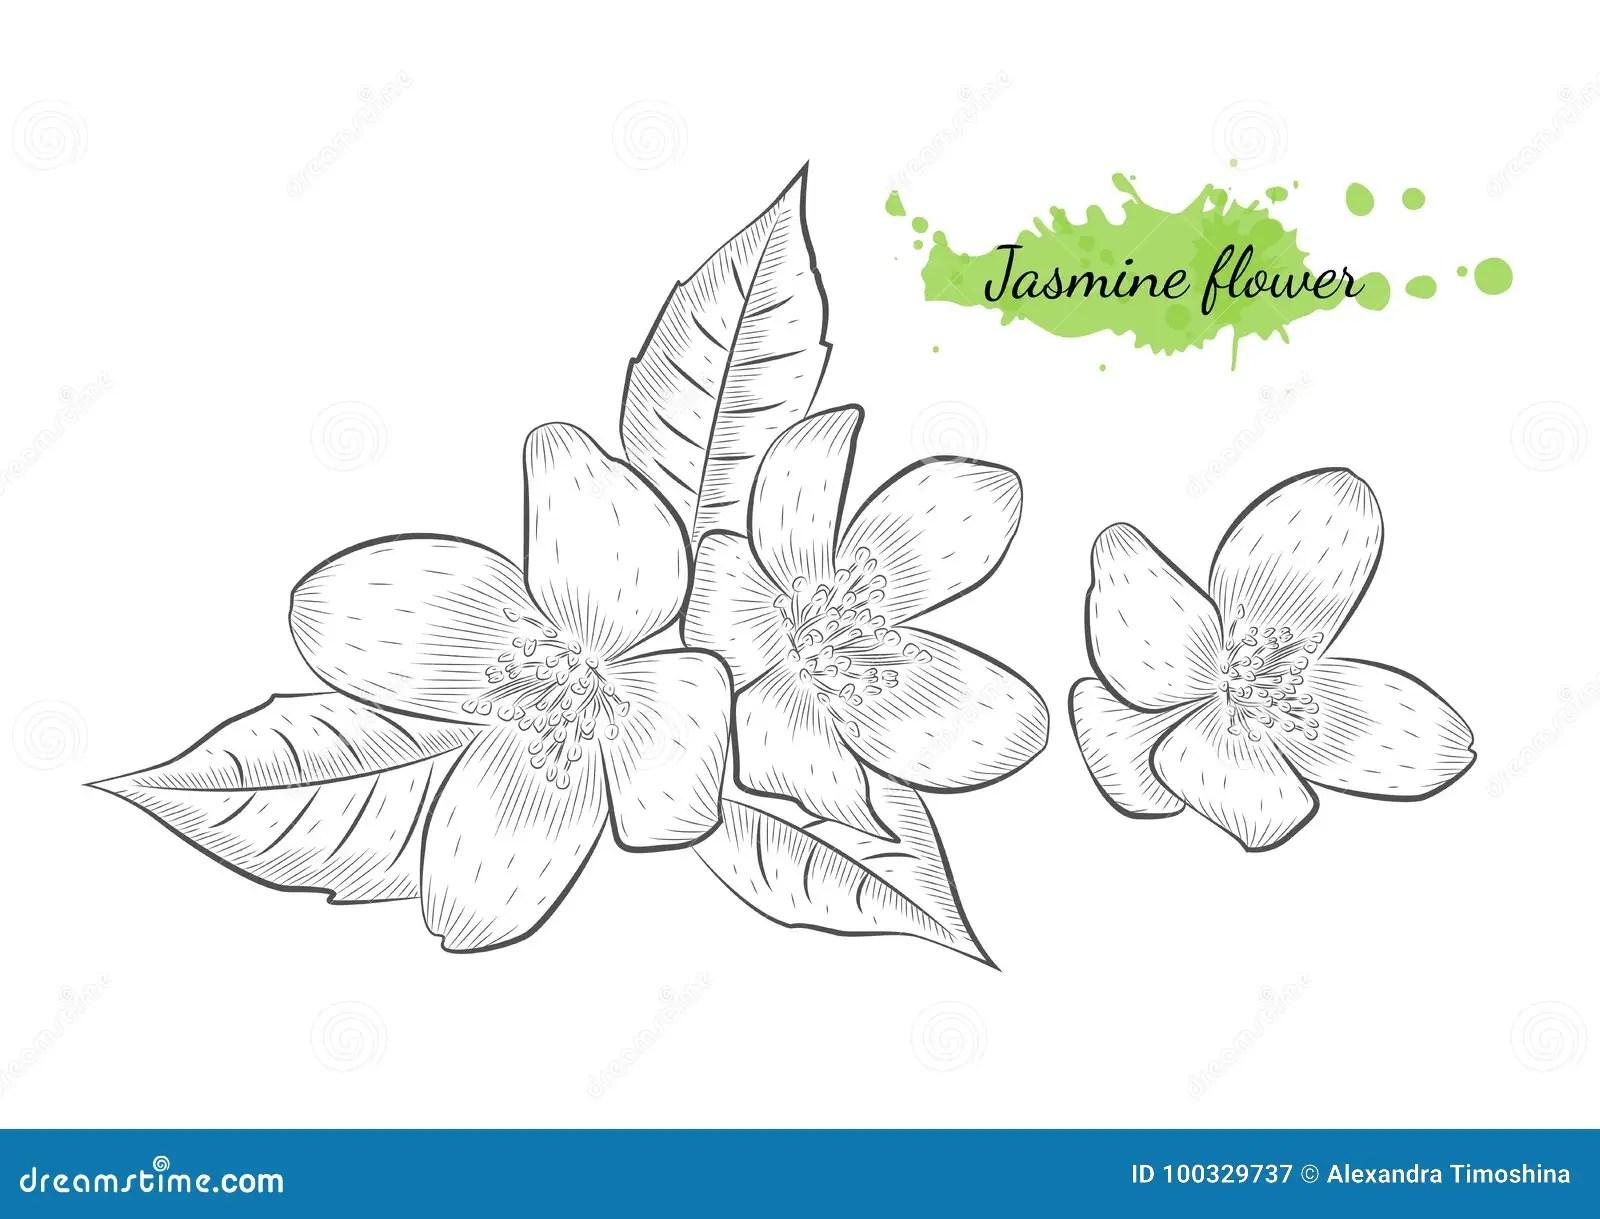 Jasmine Cartoons Illustrations Amp Vector Stock Images